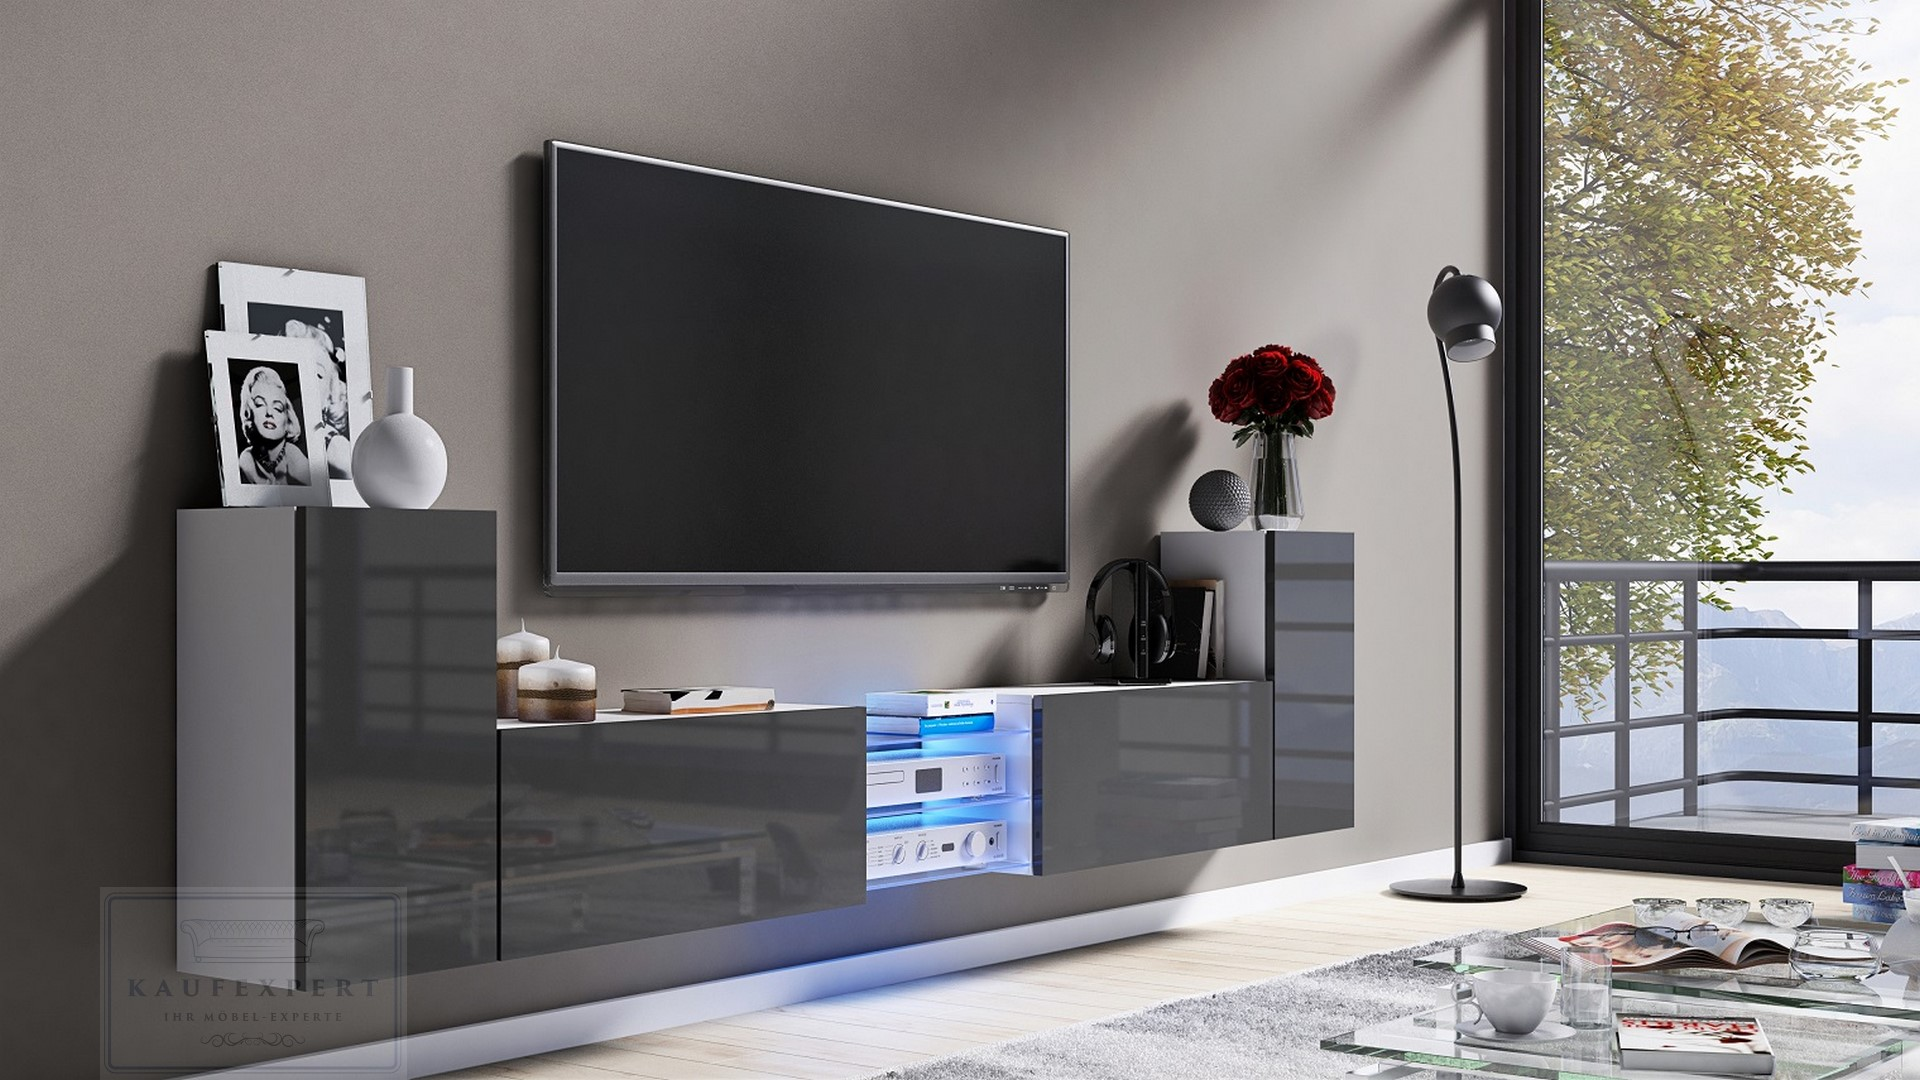 Tv Lowboard Galaxy Grau Hochglanz Weiss Mdf Design Board Hifi Tisch Beleuchtung Modern Wohnwand Schrank Mobel